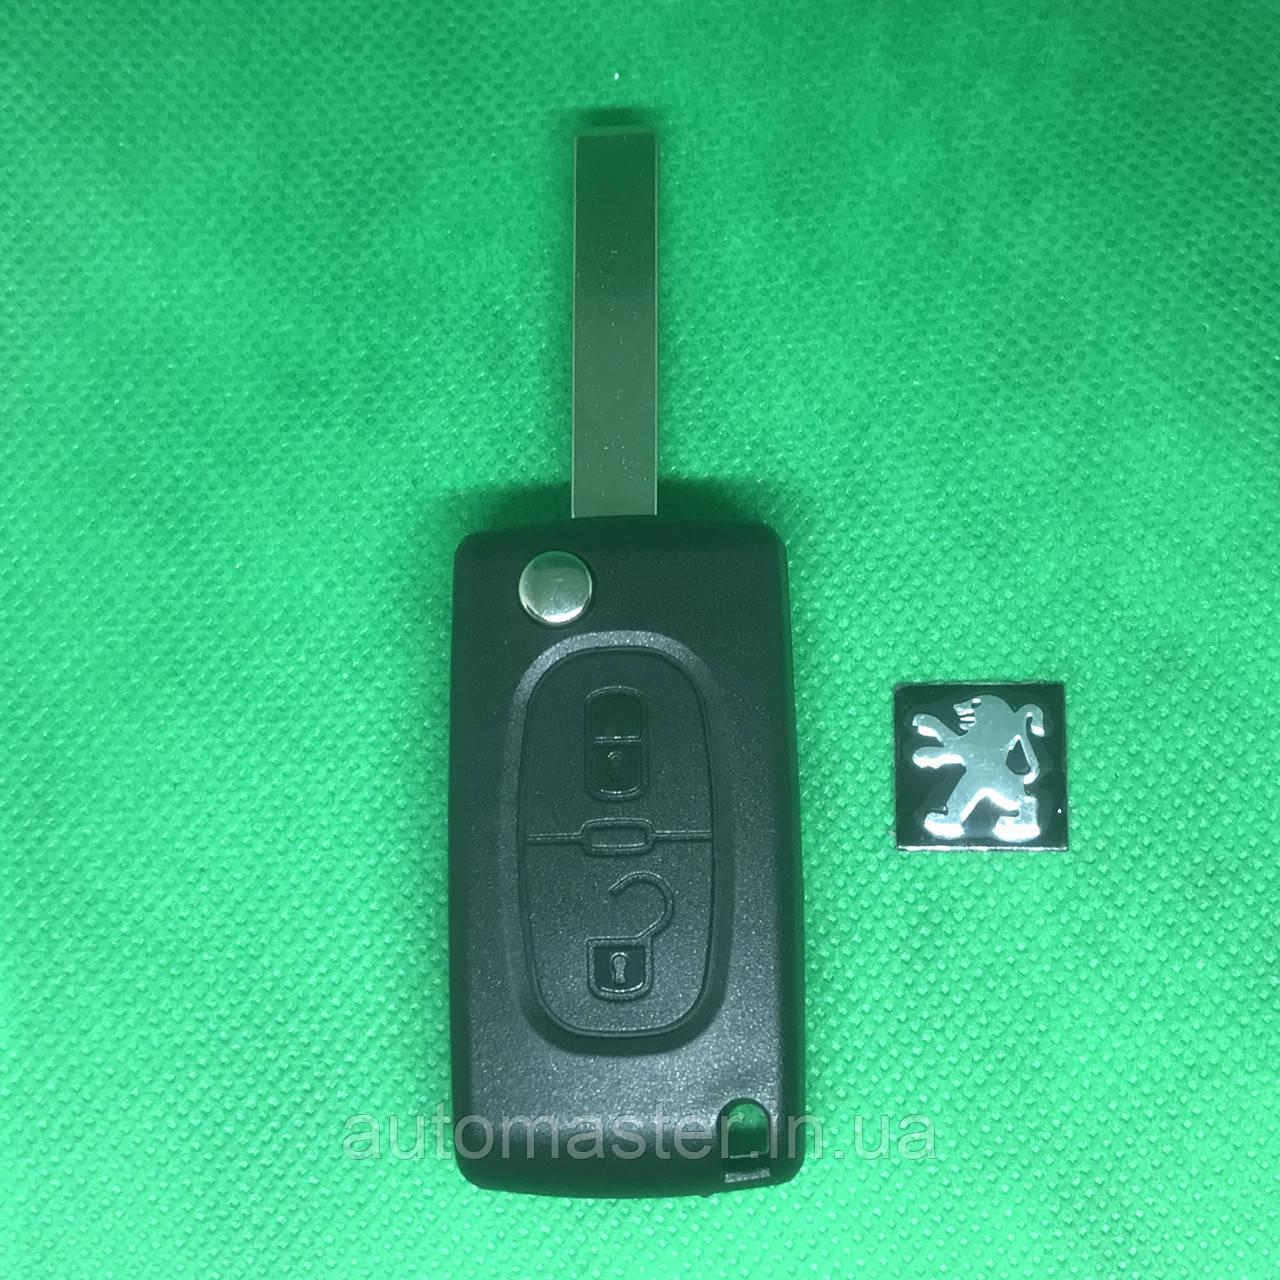 Ключ для PEUGEOT (Пежо) 207, 307, 308, 3008,407 2 - кнопки с чипом ID46(7961)/433MHZ